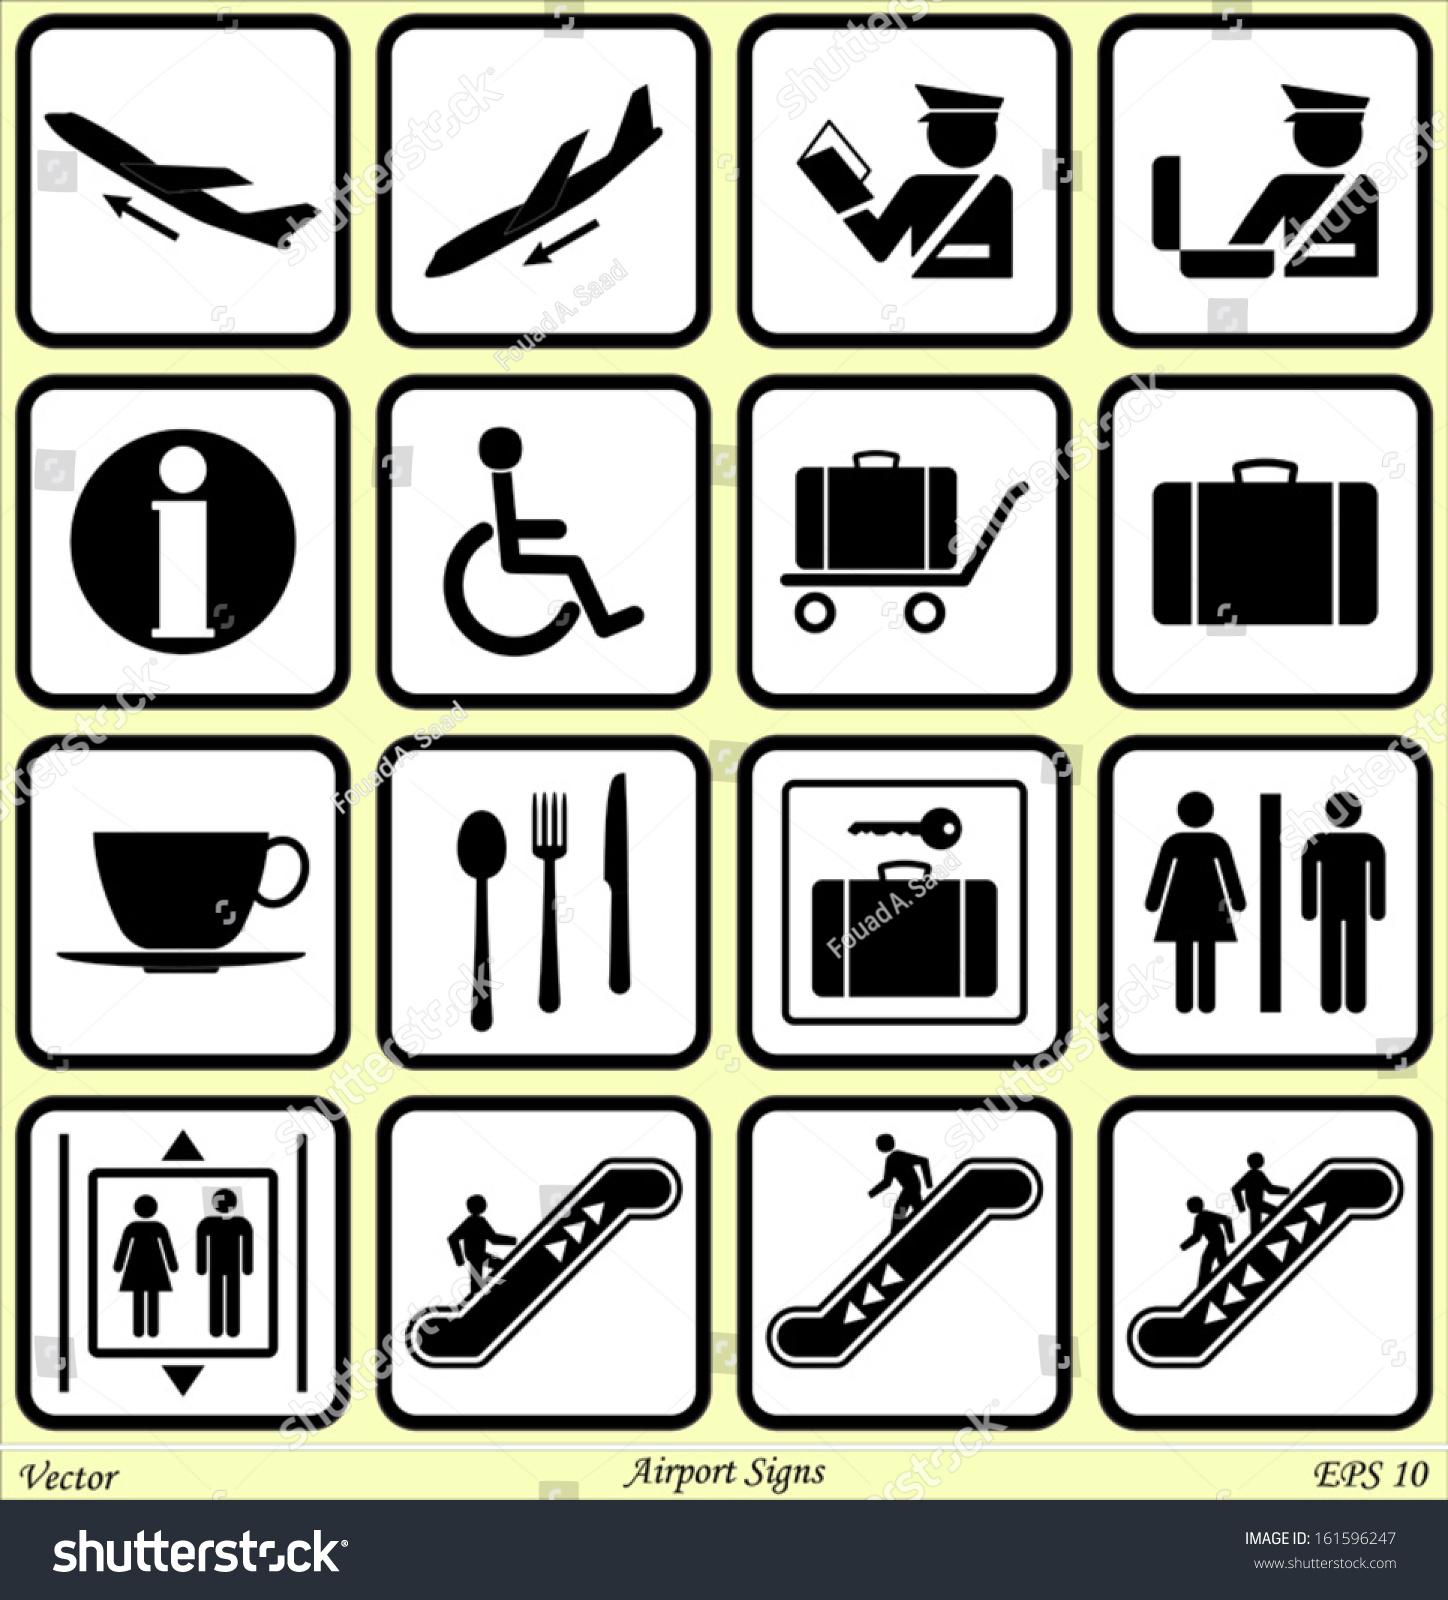 Airport Signs Stock Vector 161596247 - Shutterstock